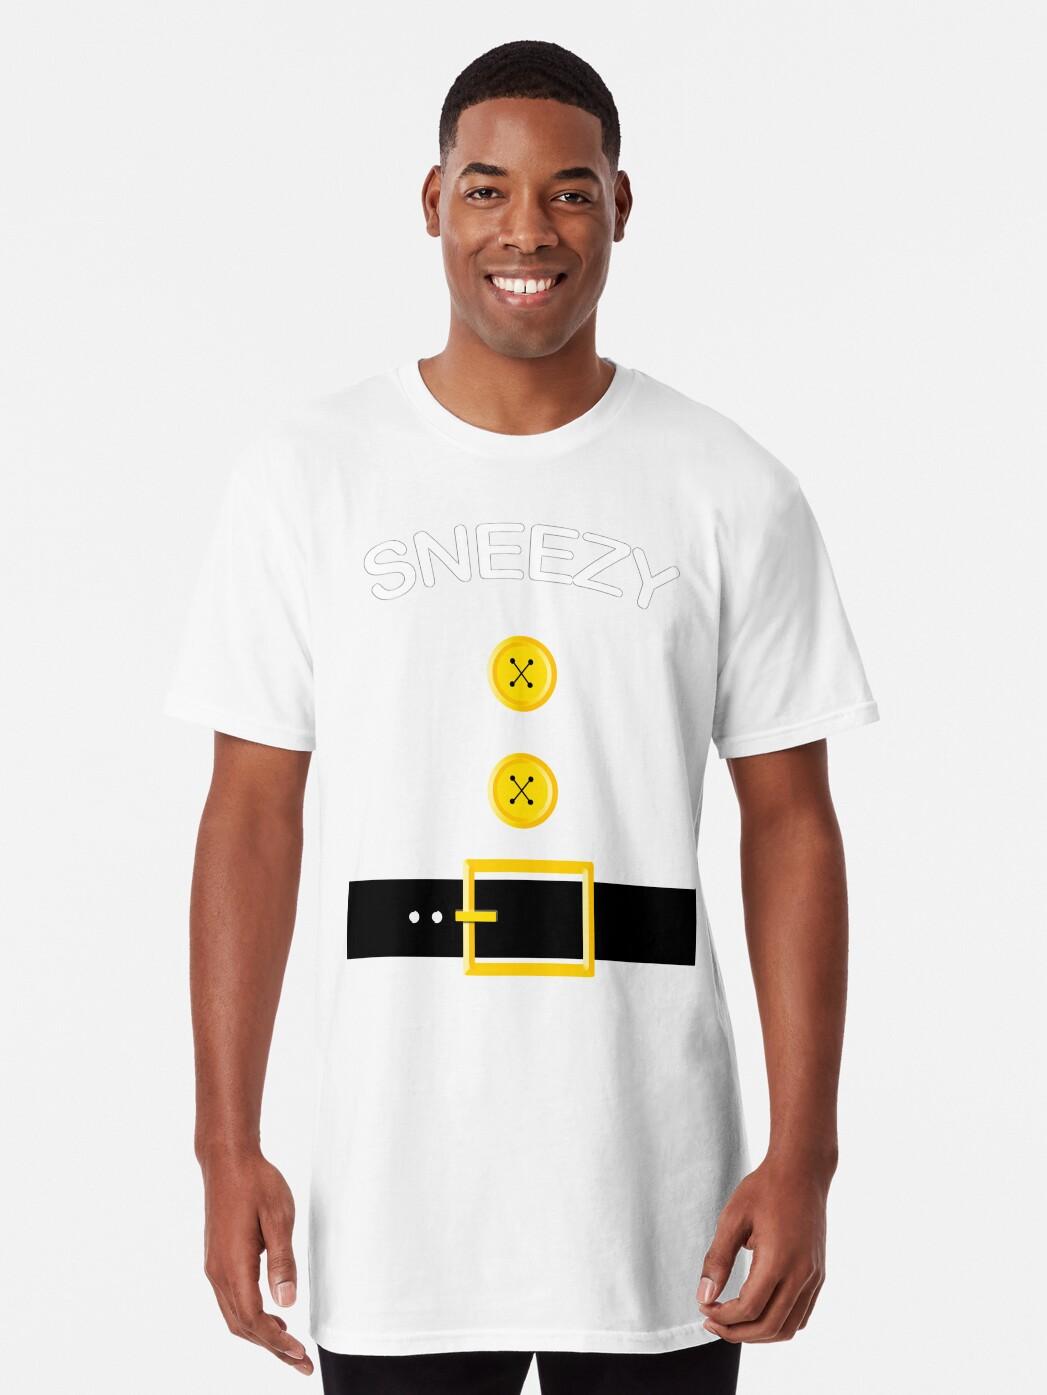 ccfa7a1cd8d Snow White Sneezy 7 Dwarfs Halloween Thanksgiving Group Costume Shirt Long  T-Shirt Front